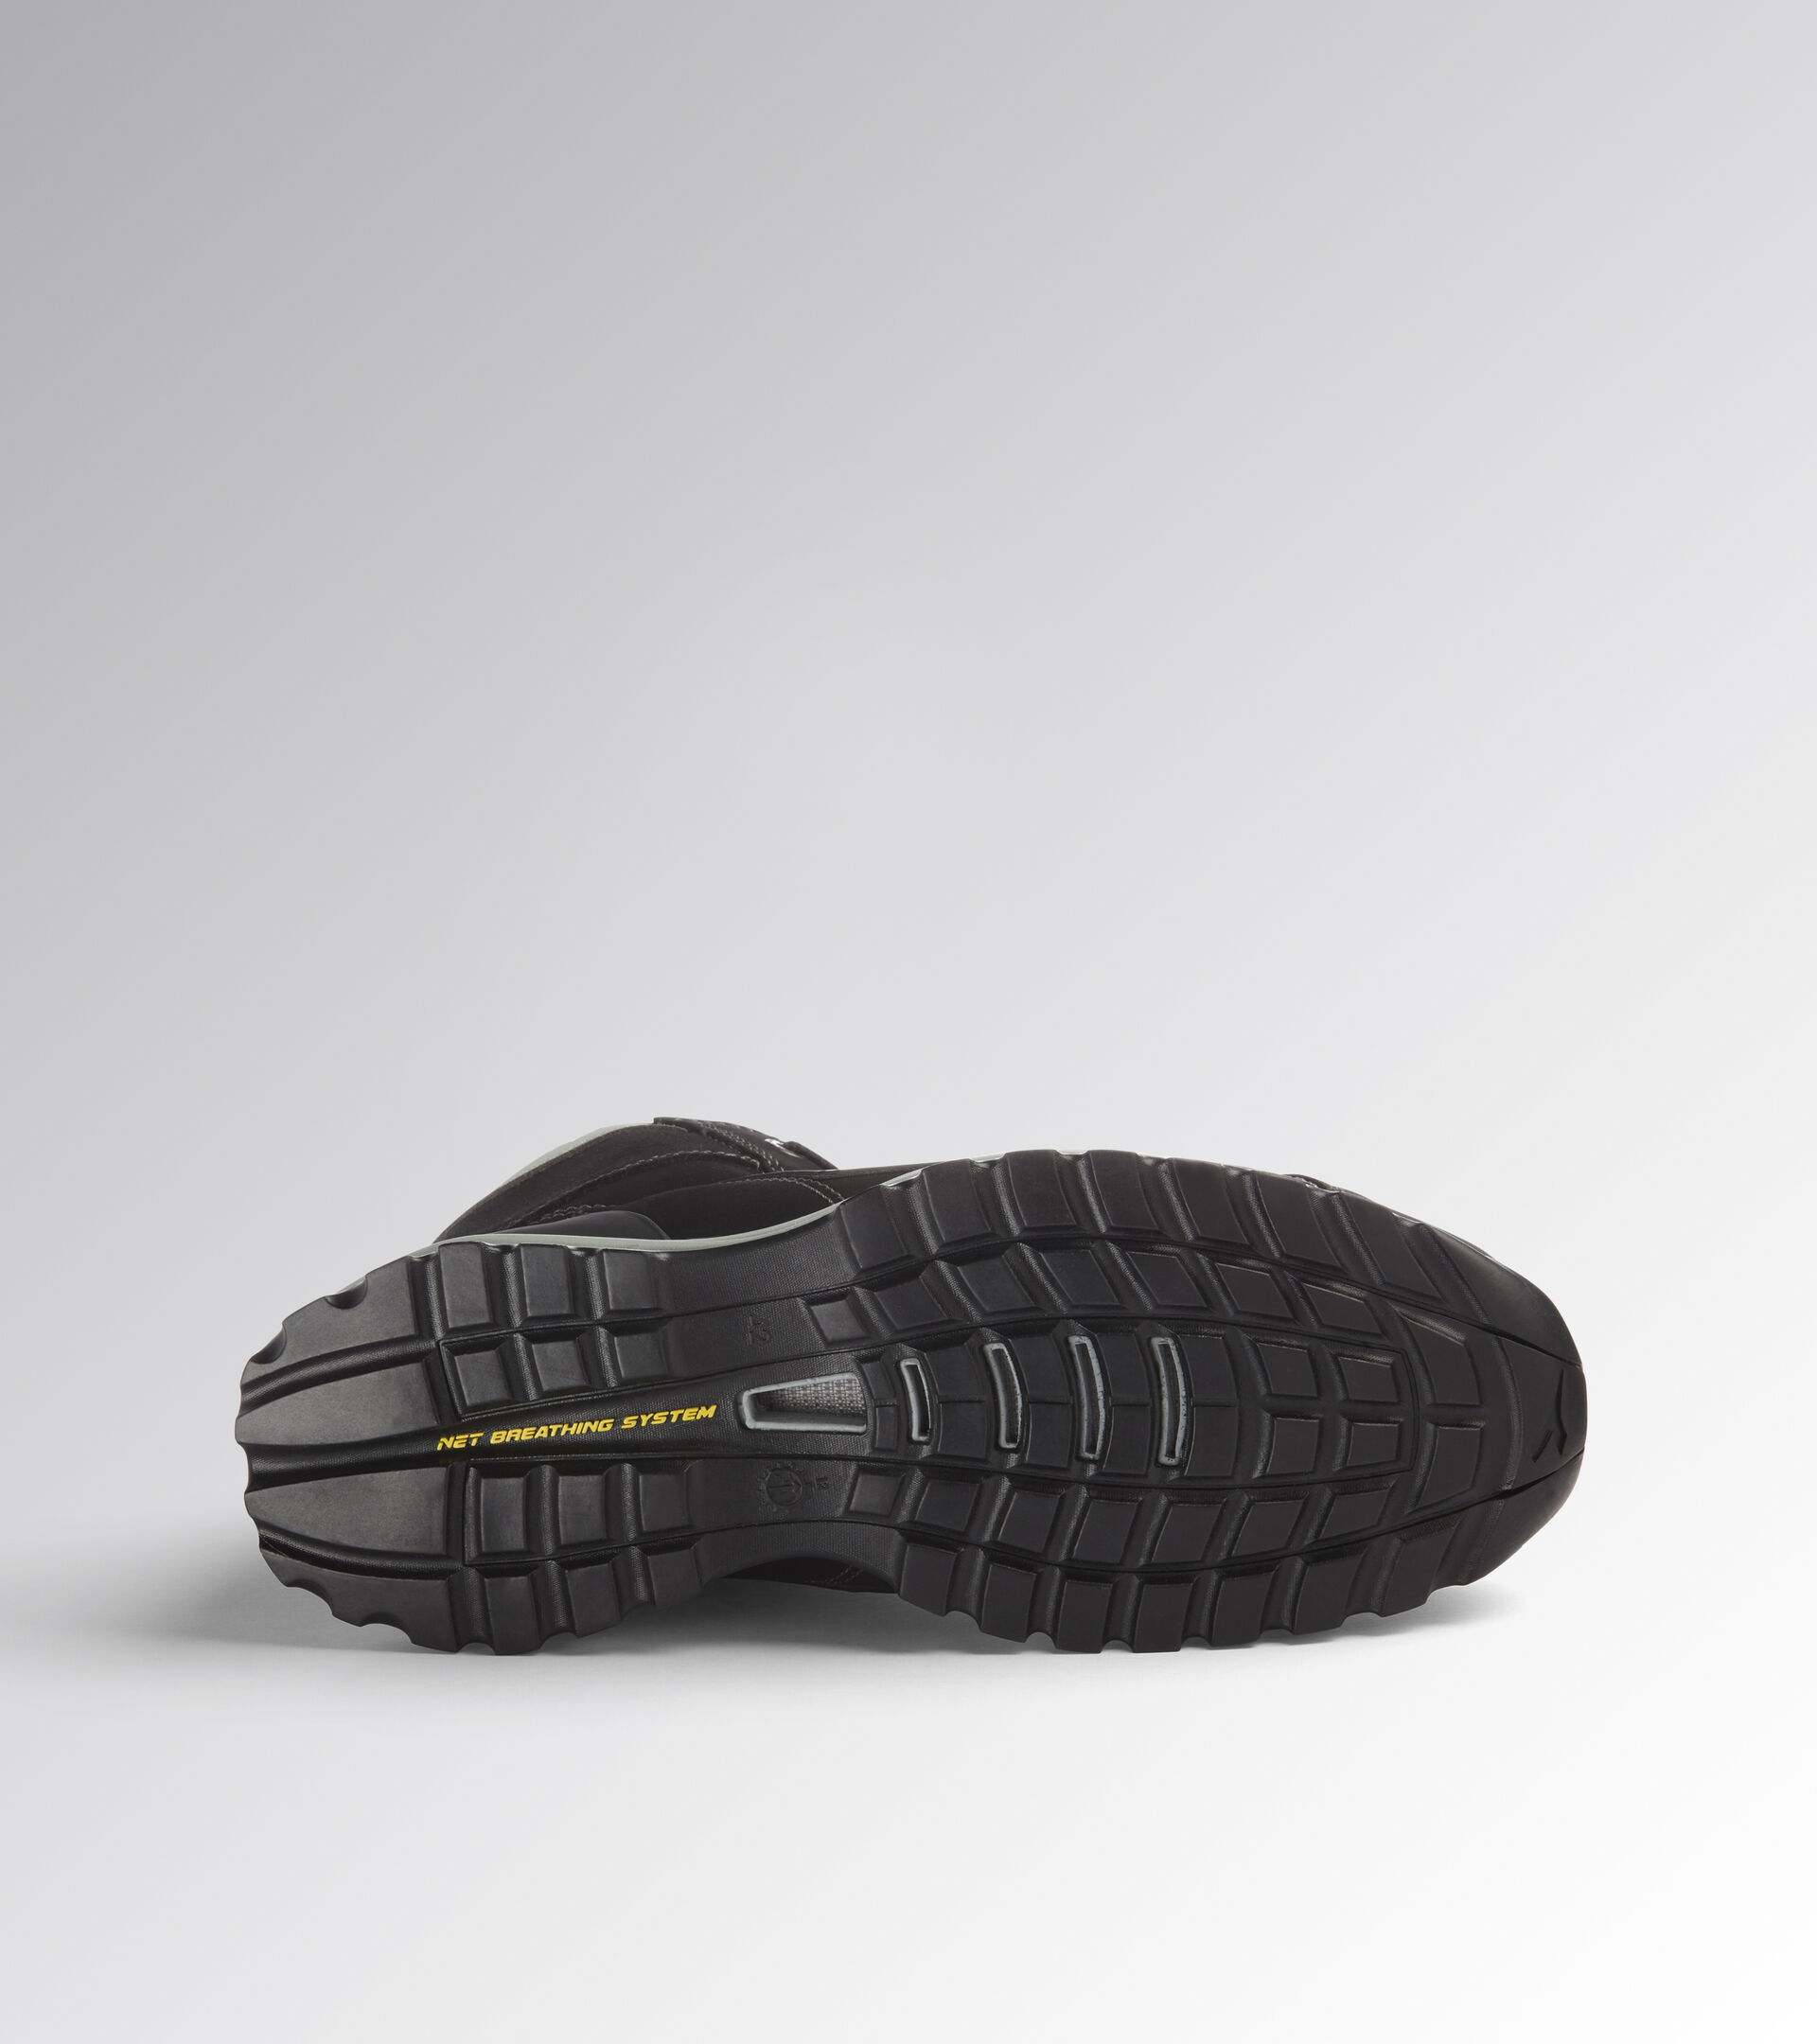 Footwear Utility UNISEX GLOVE NET MID PRO S3 HRO SRA ESD SCHWARZ Utility